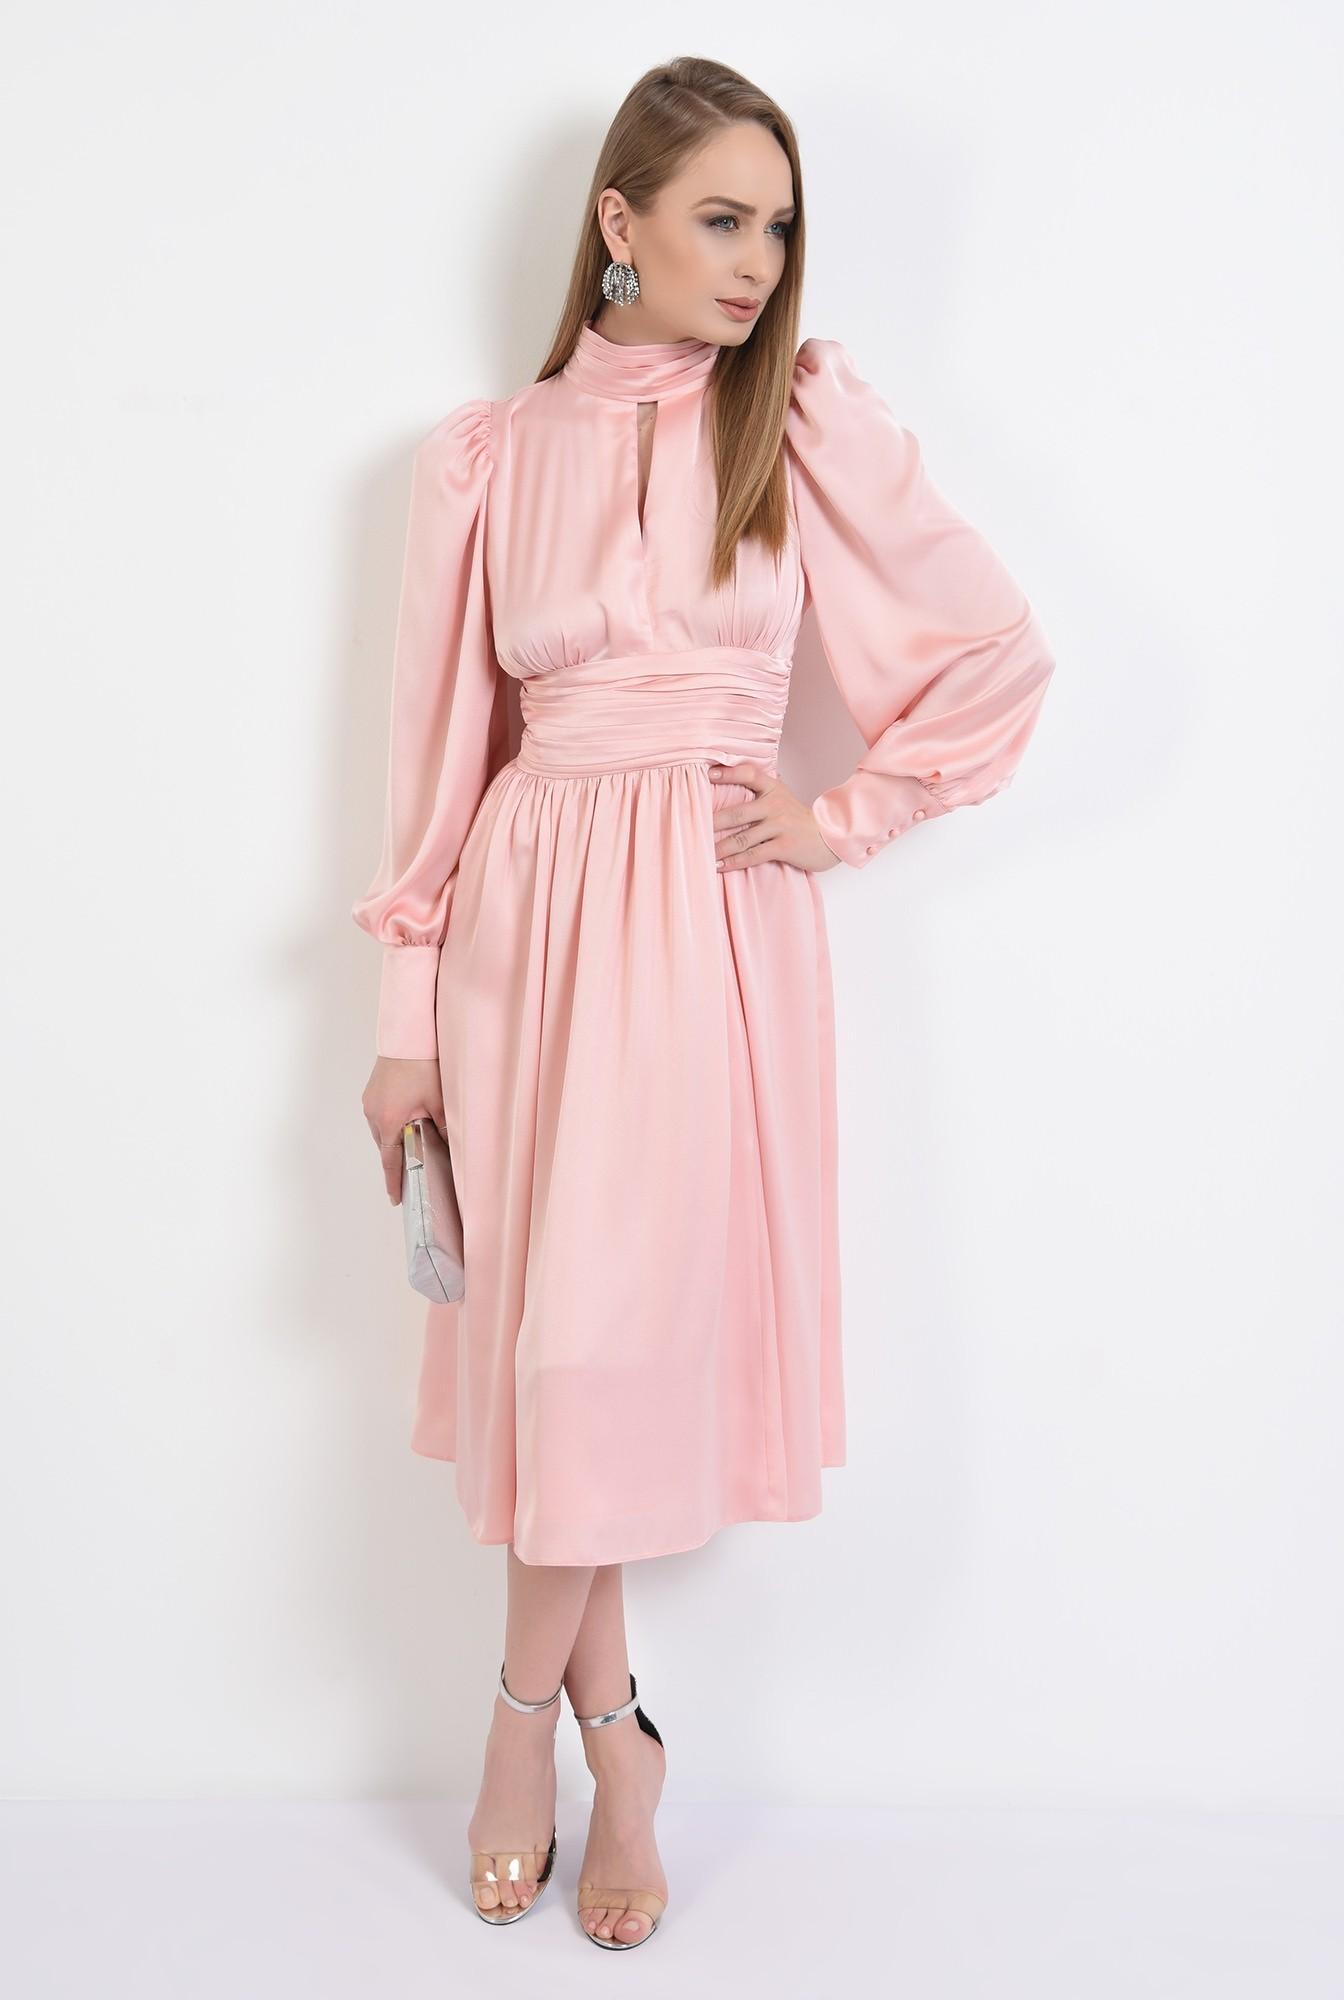 360 - rochie eleganta, din satin, evazata, midi, brau fronsat, roz